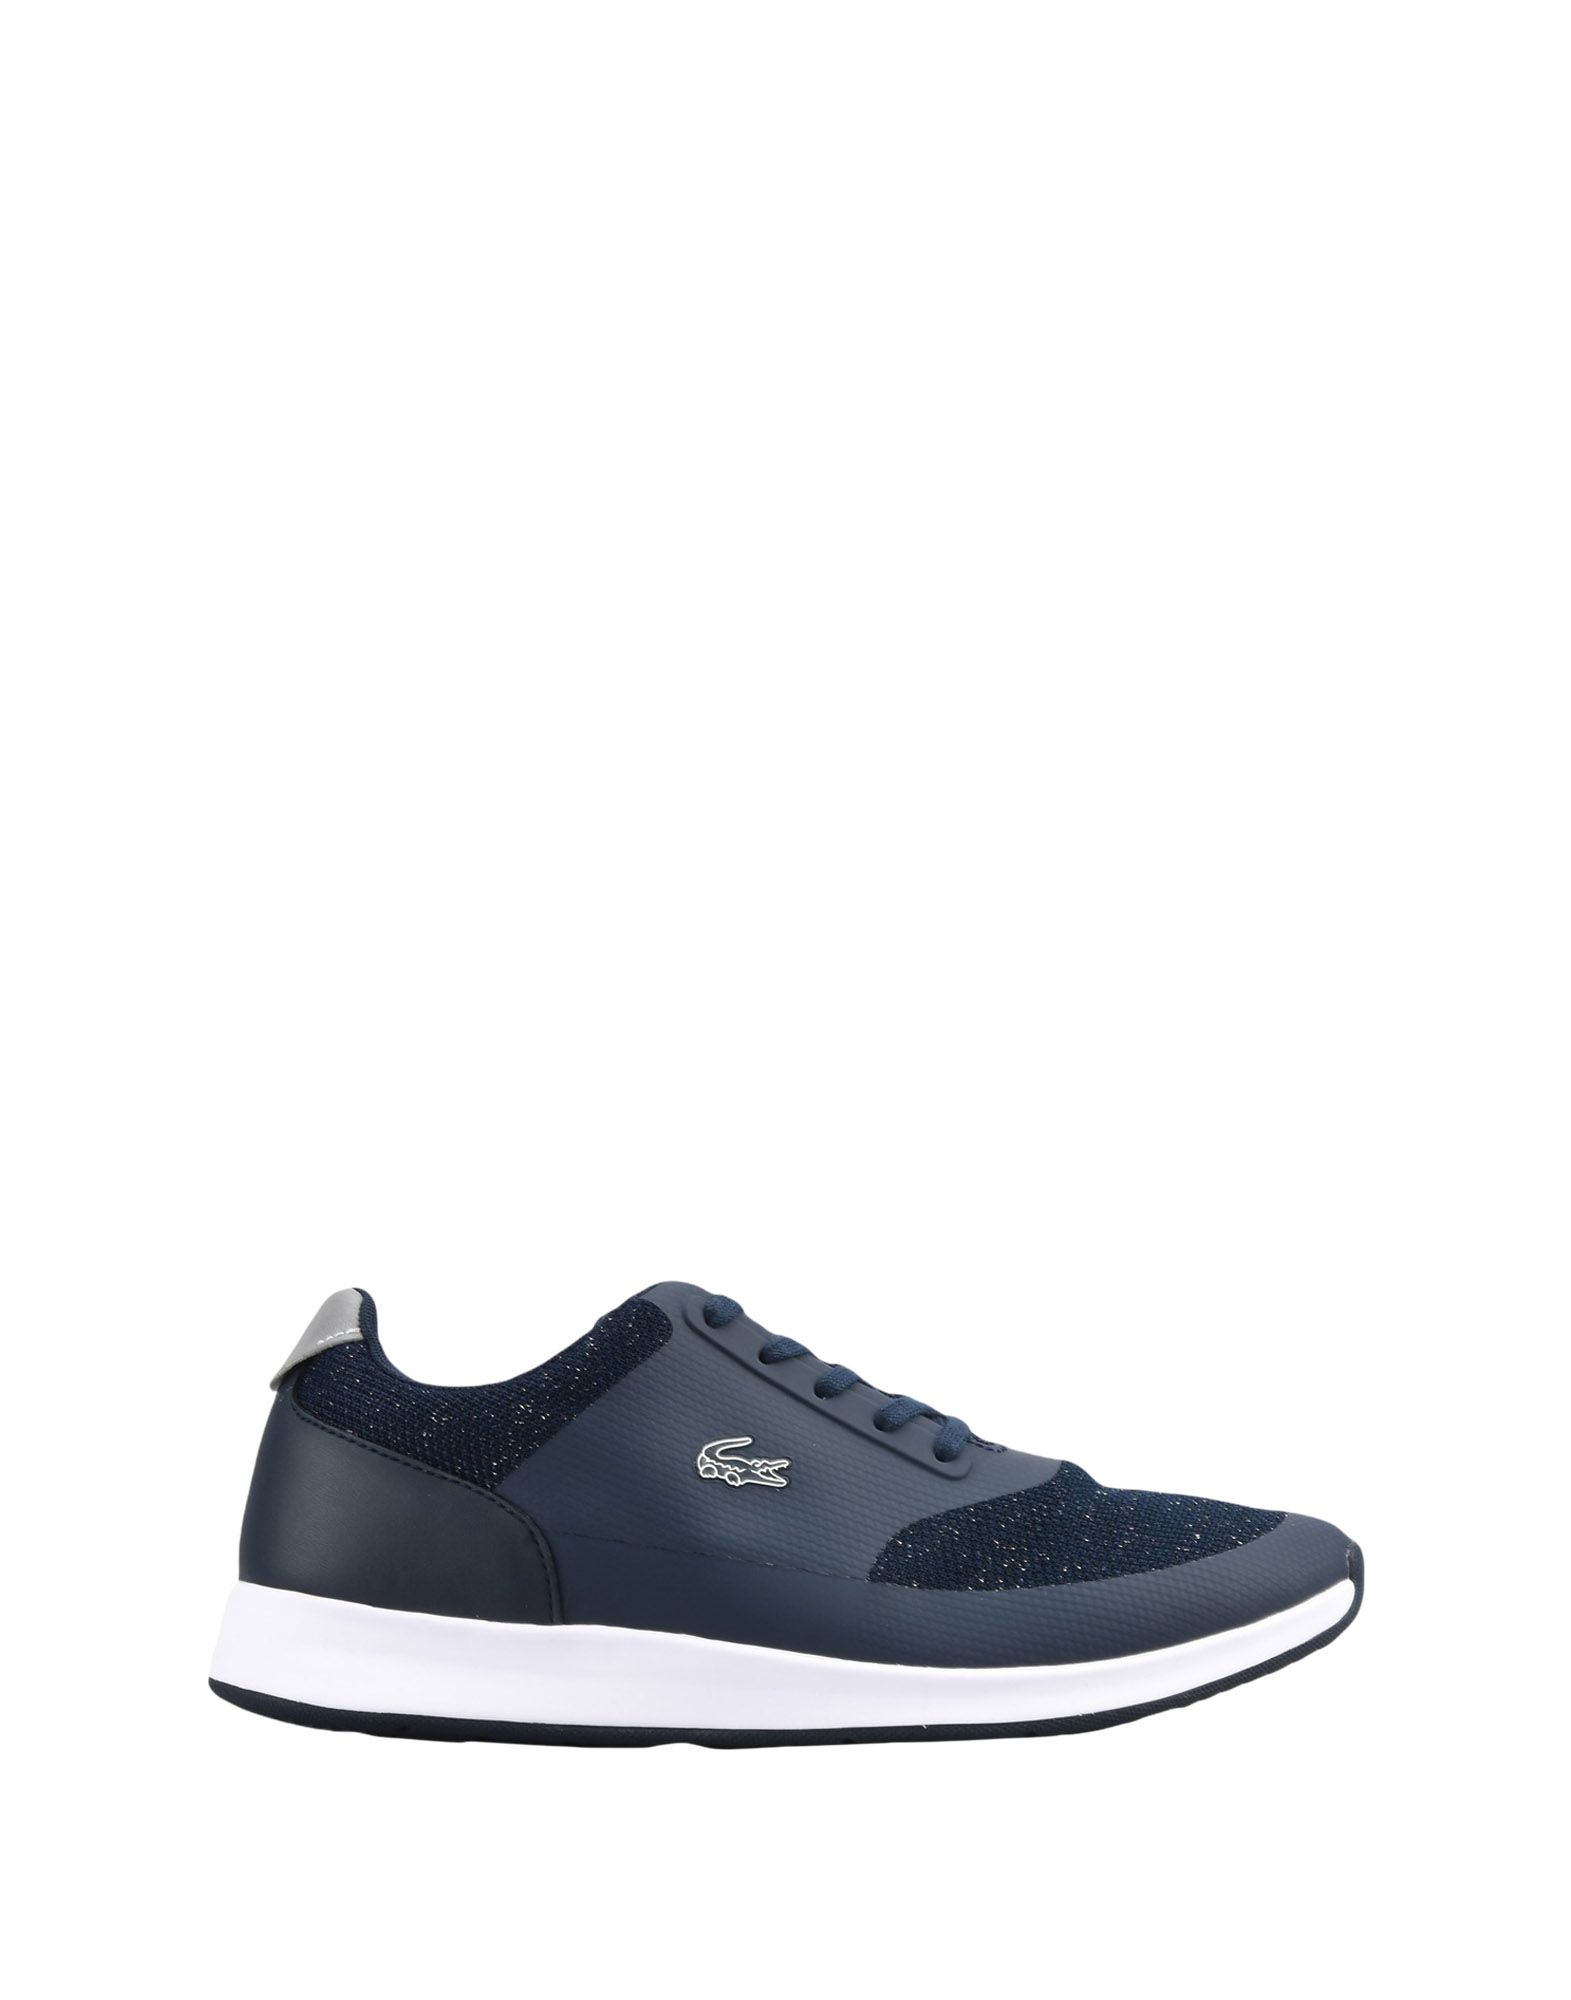 ... Sneakers Lacoste Sport Chaumont Lace 117 1 - Femme - Sneakers Lacoste  Sport sur ...